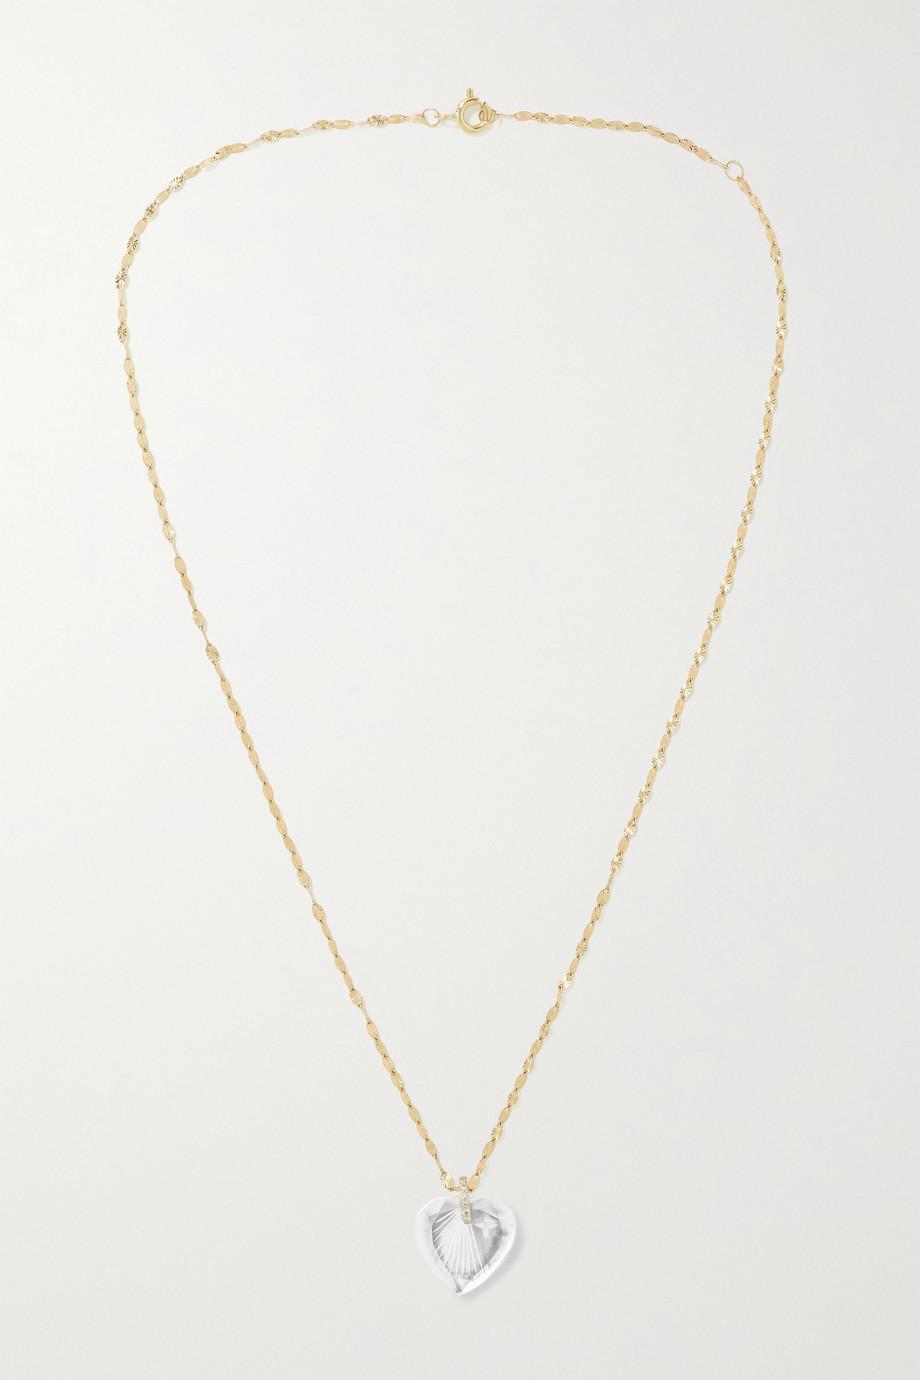 Pascale Monvoisin Gabin N°3 14 and 9-karat gold, crystal and diamond necklace